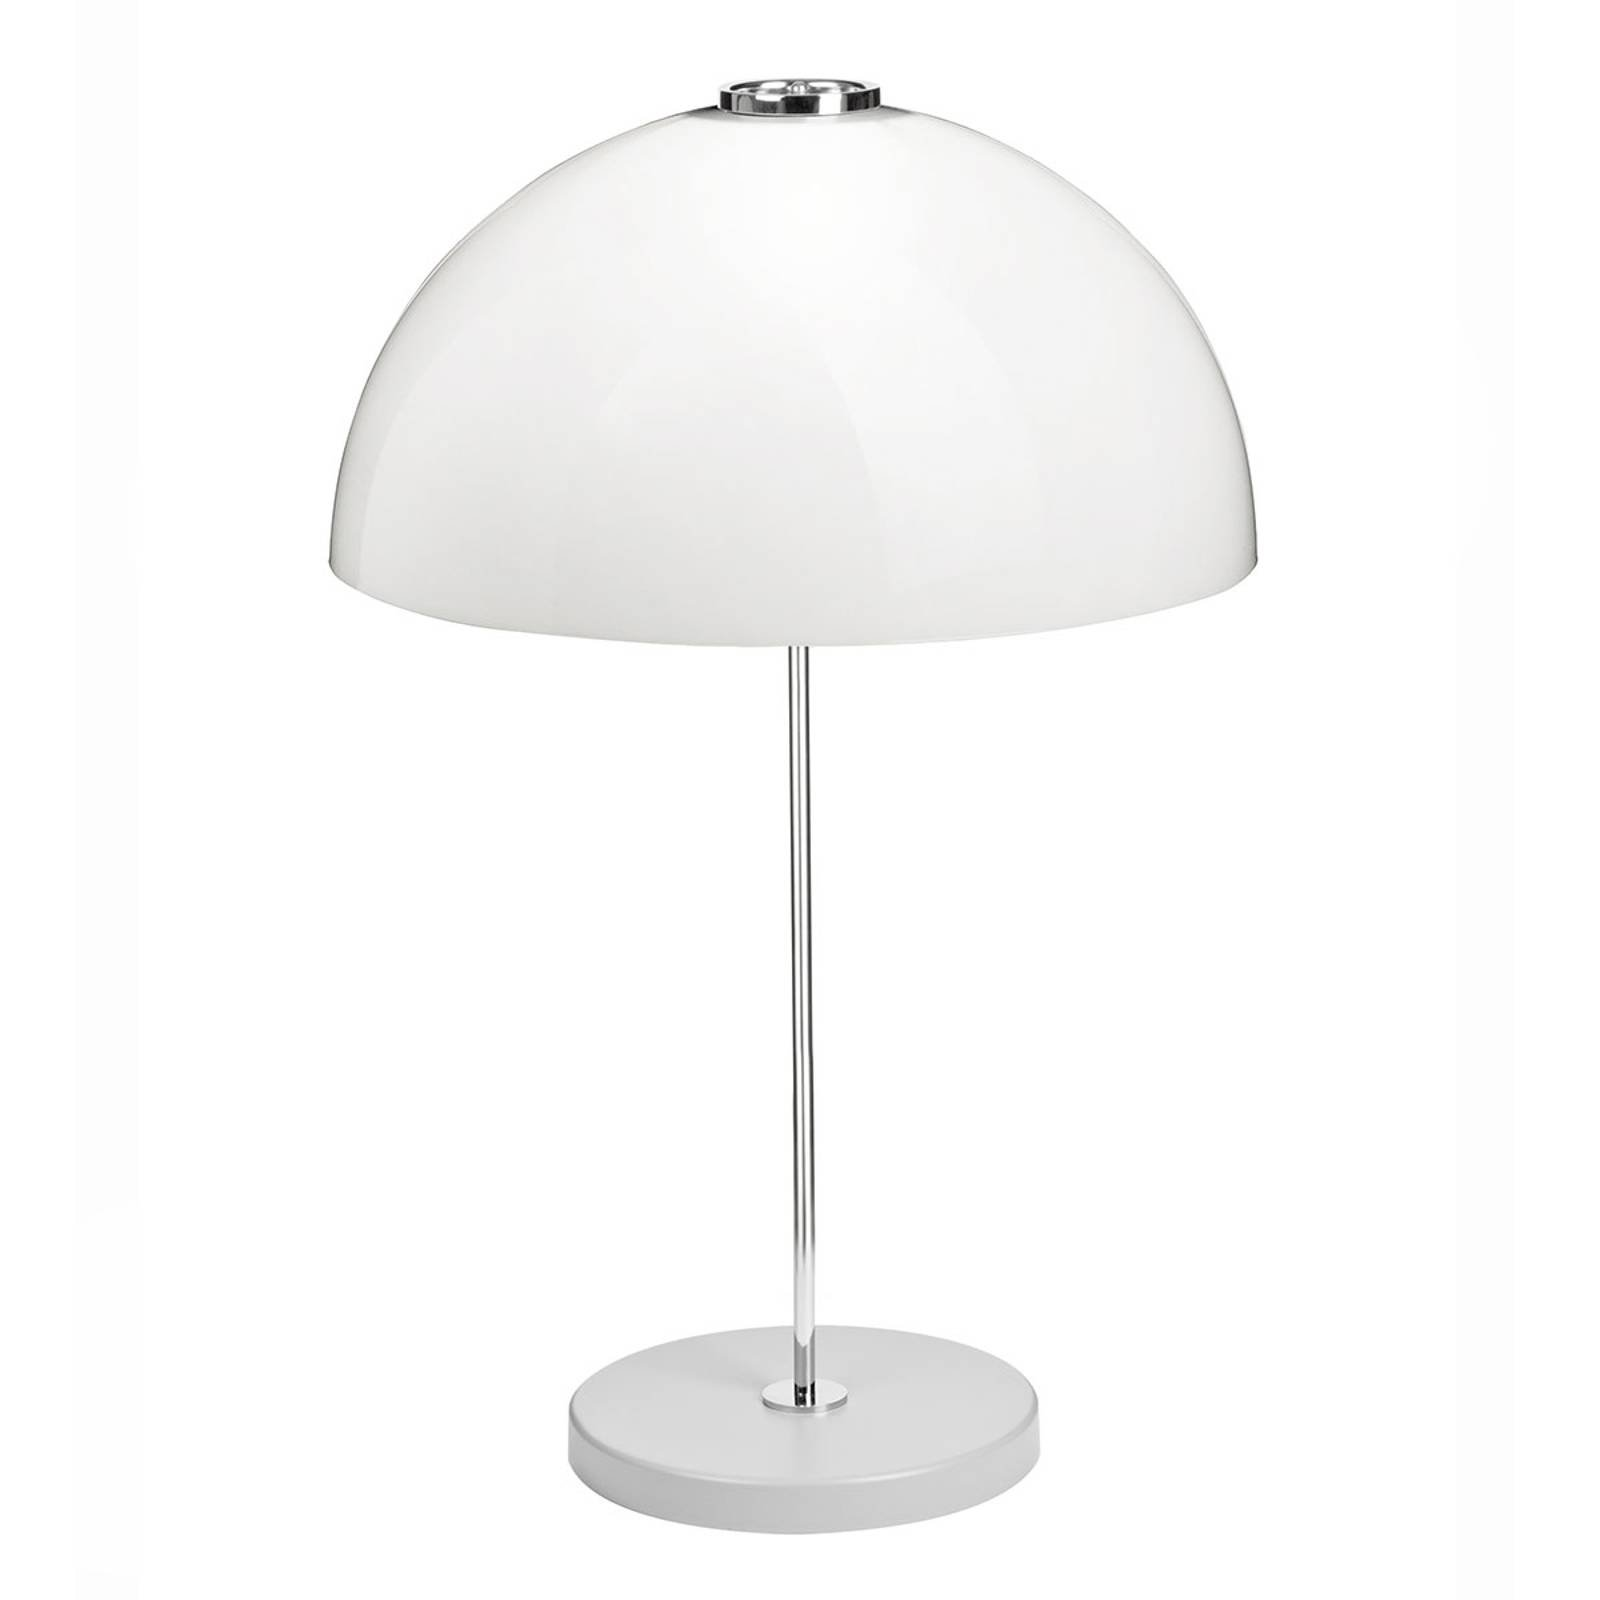 Innolux Kupoli bordlampe, grå fot